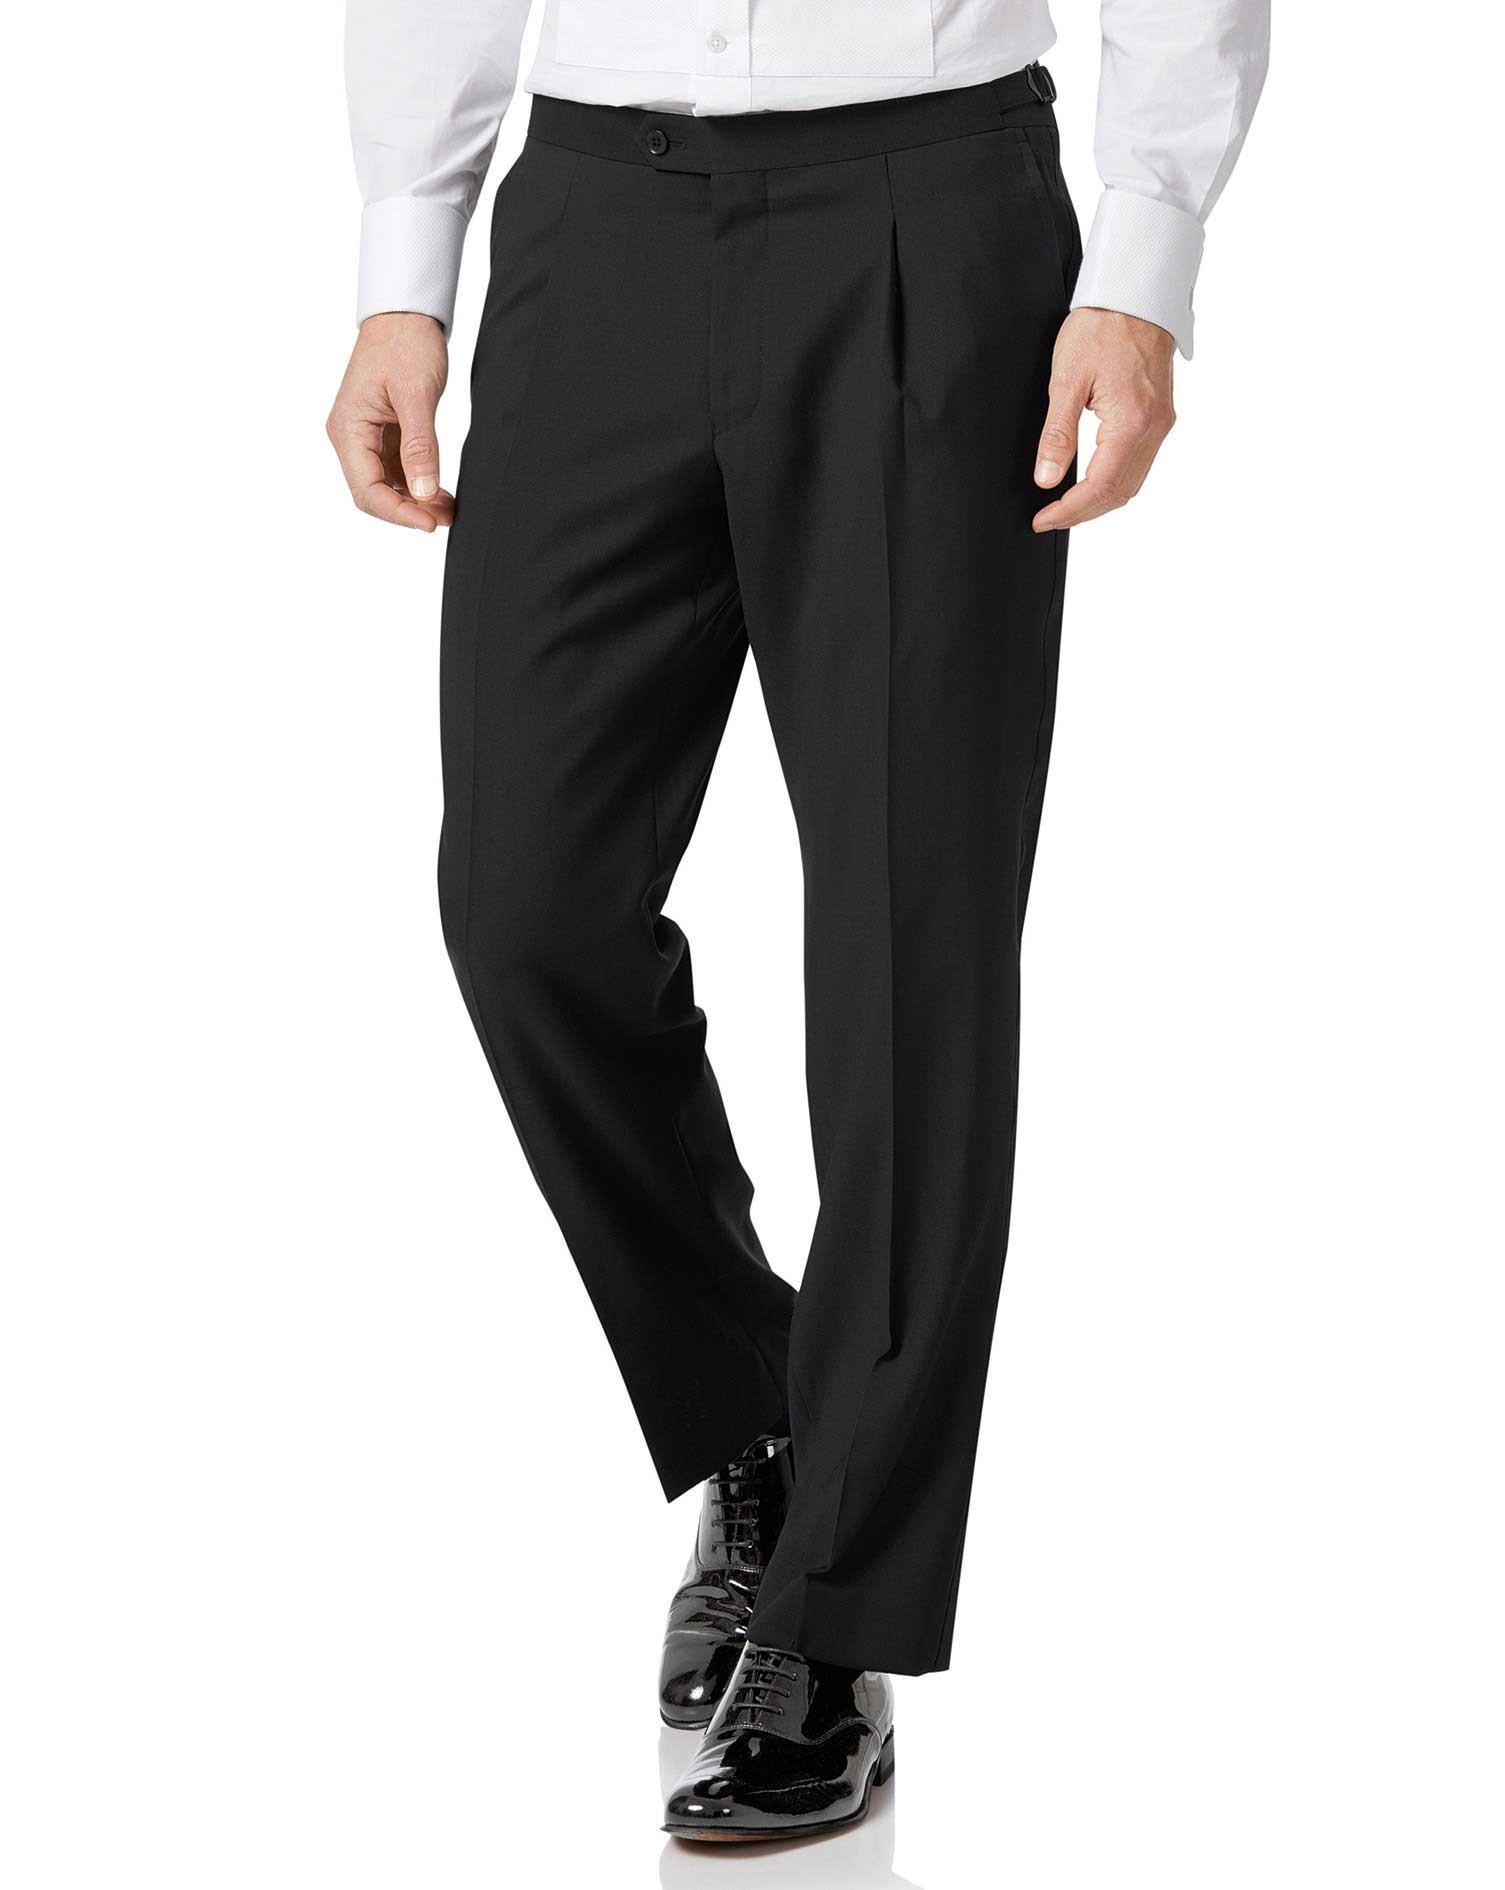 Black Classic Fit Tuxedo Trousers Size W32 L32 by Charles Tyrwhitt thumbnail